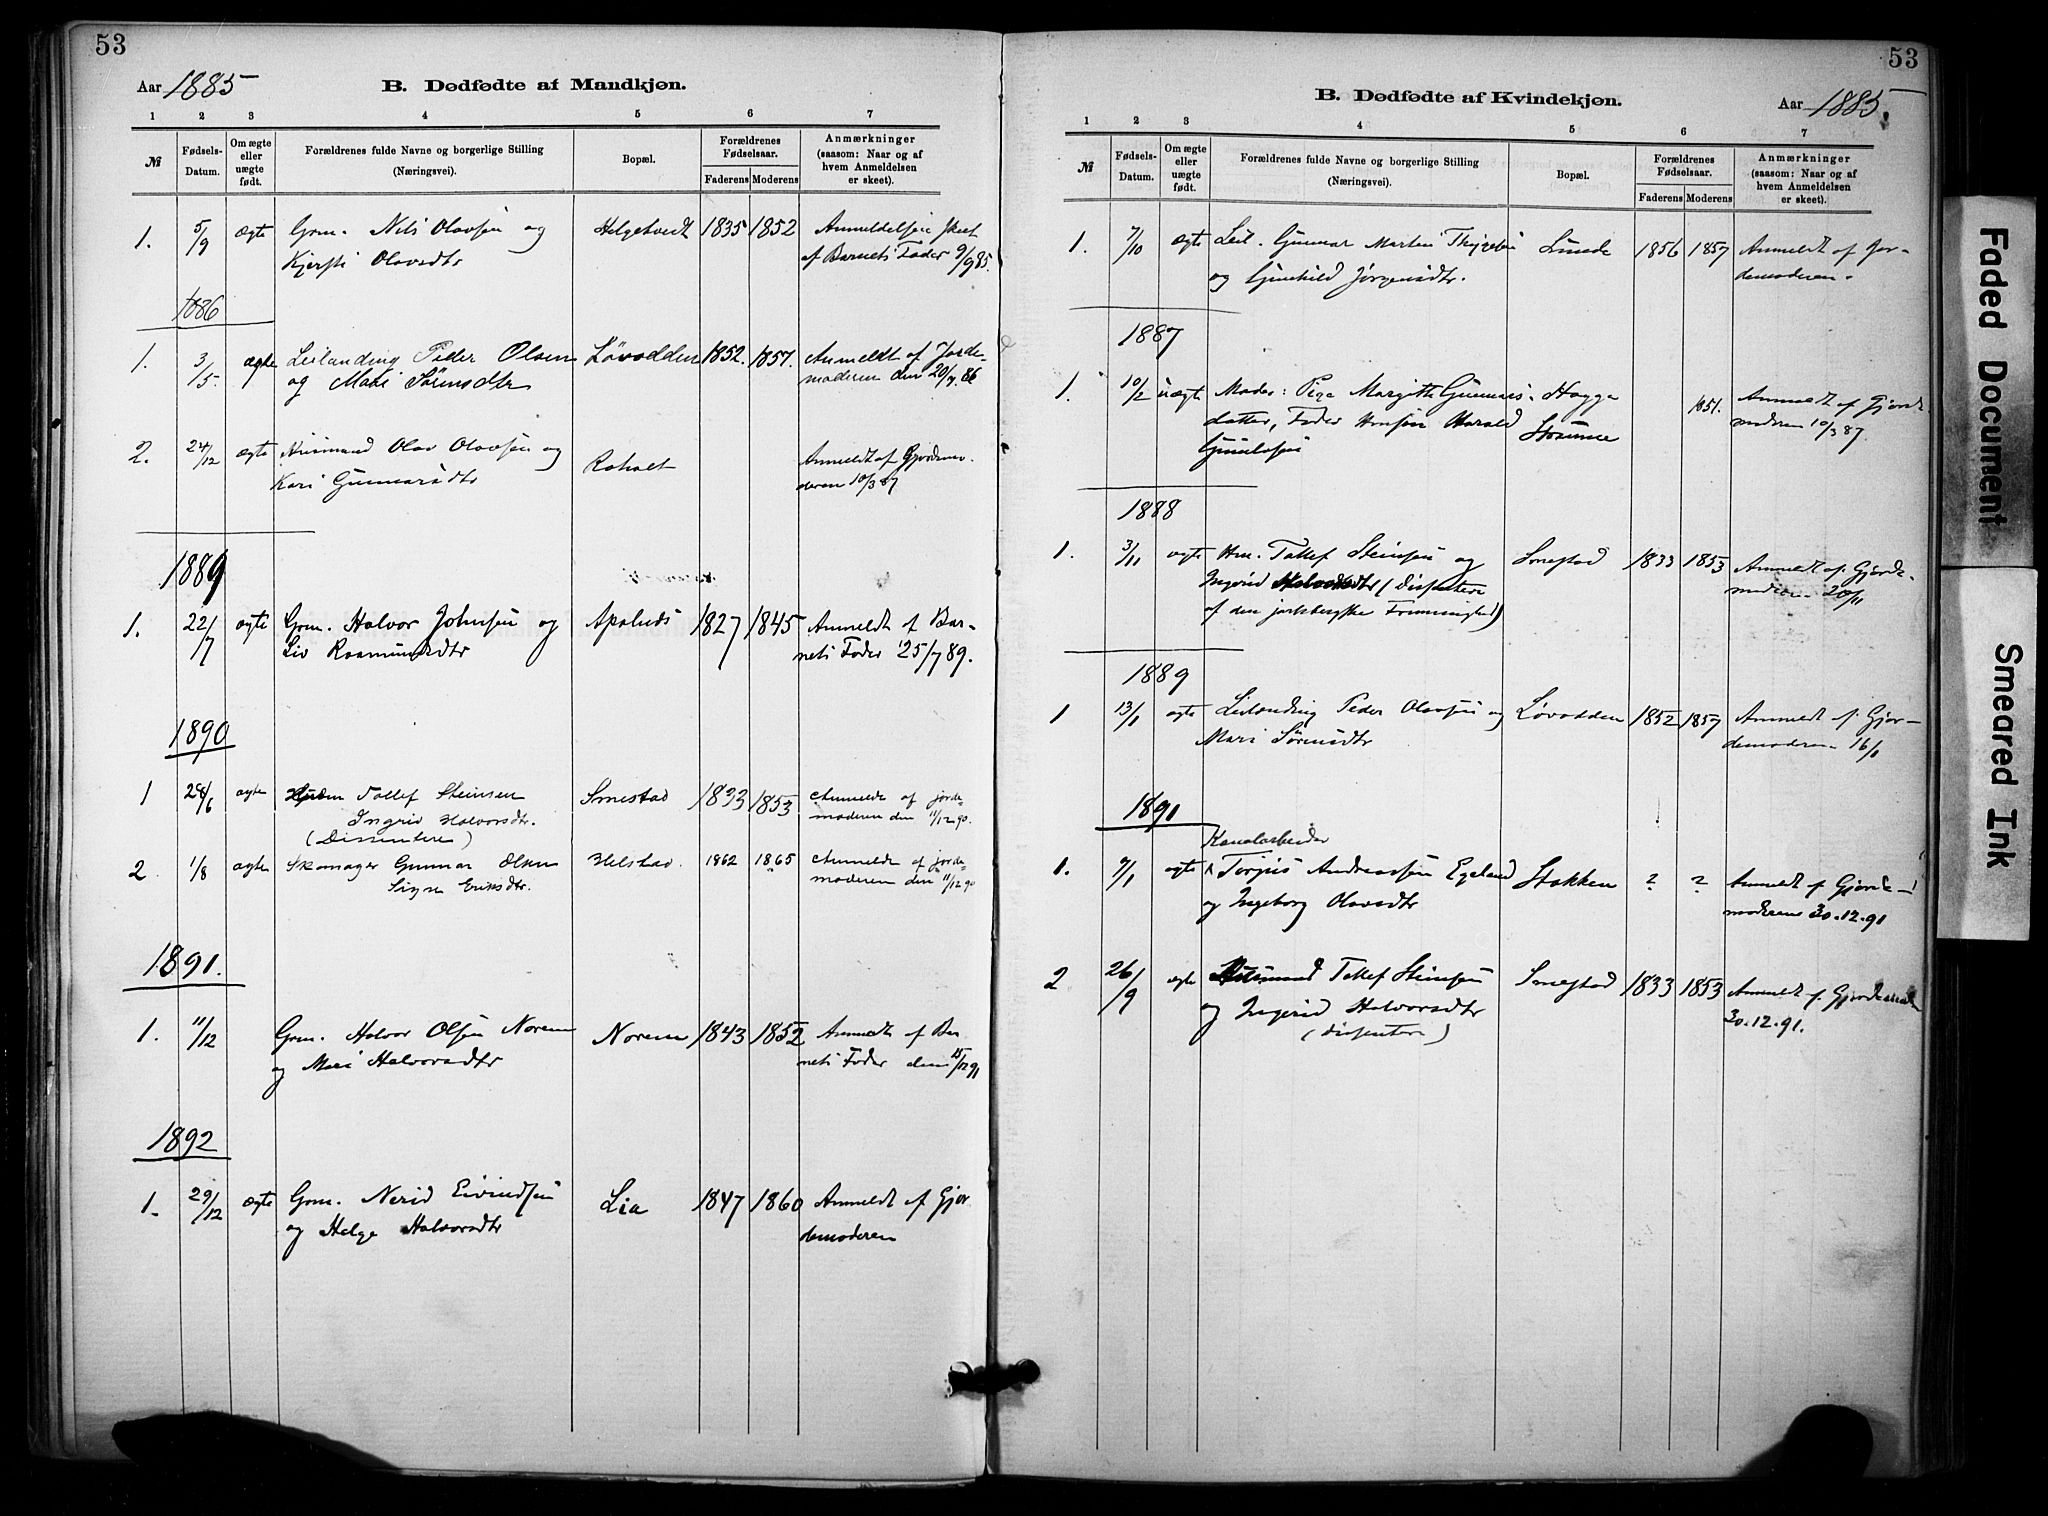 SAKO, Lunde kirkebøker, F/Fa/L0002: Ministerialbok nr. I 2, 1884-1892, s. 53